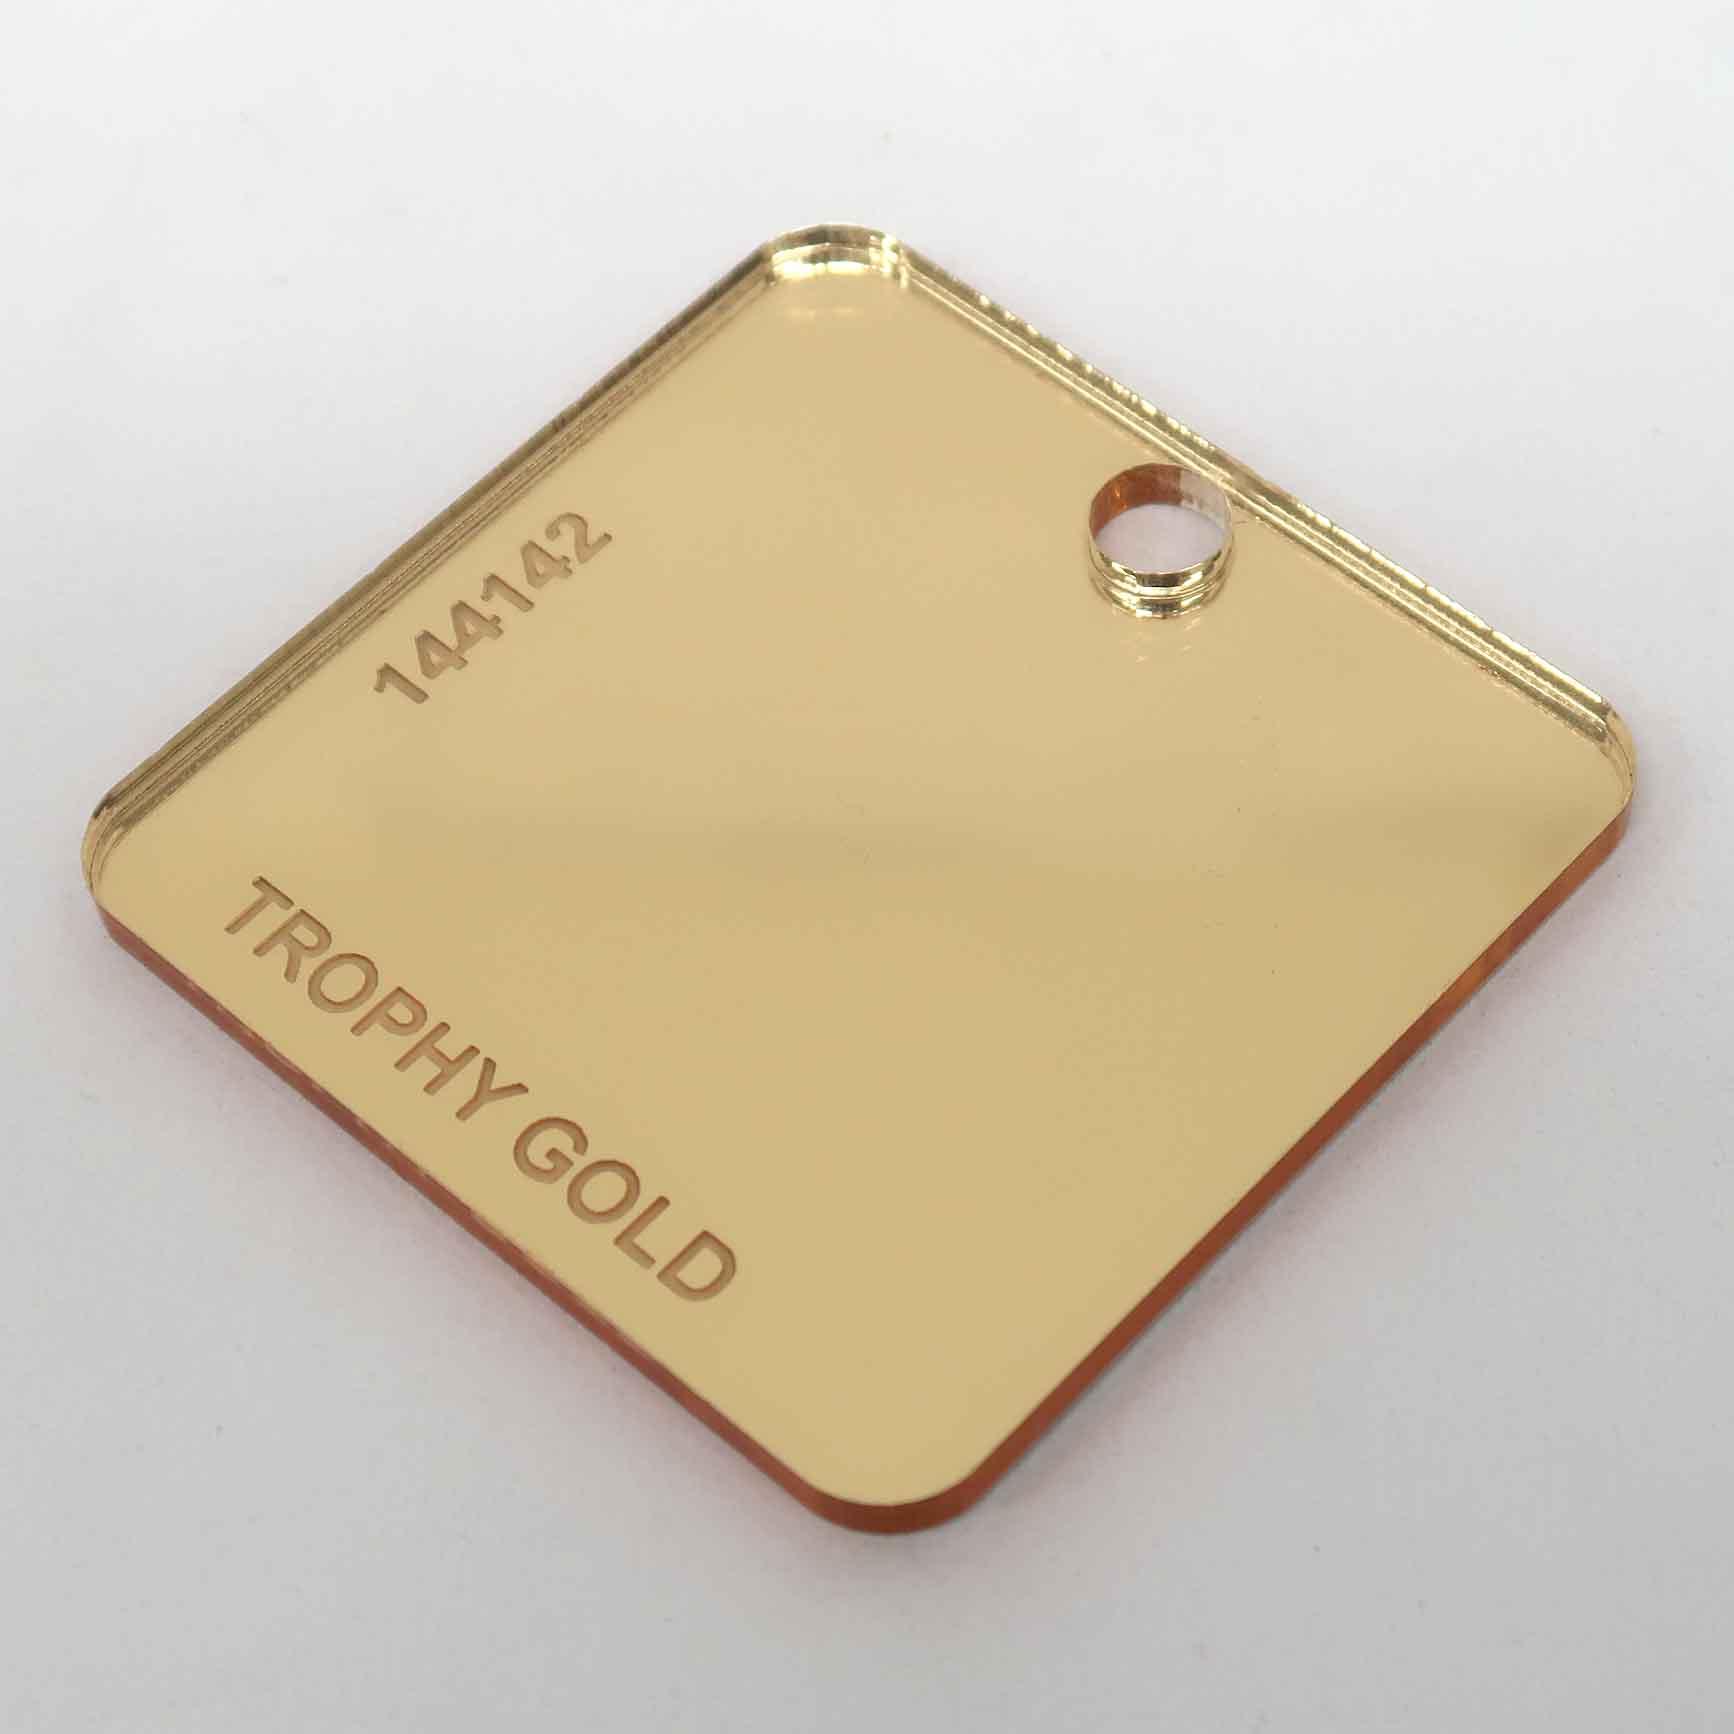 TROPHY GOLD 144142